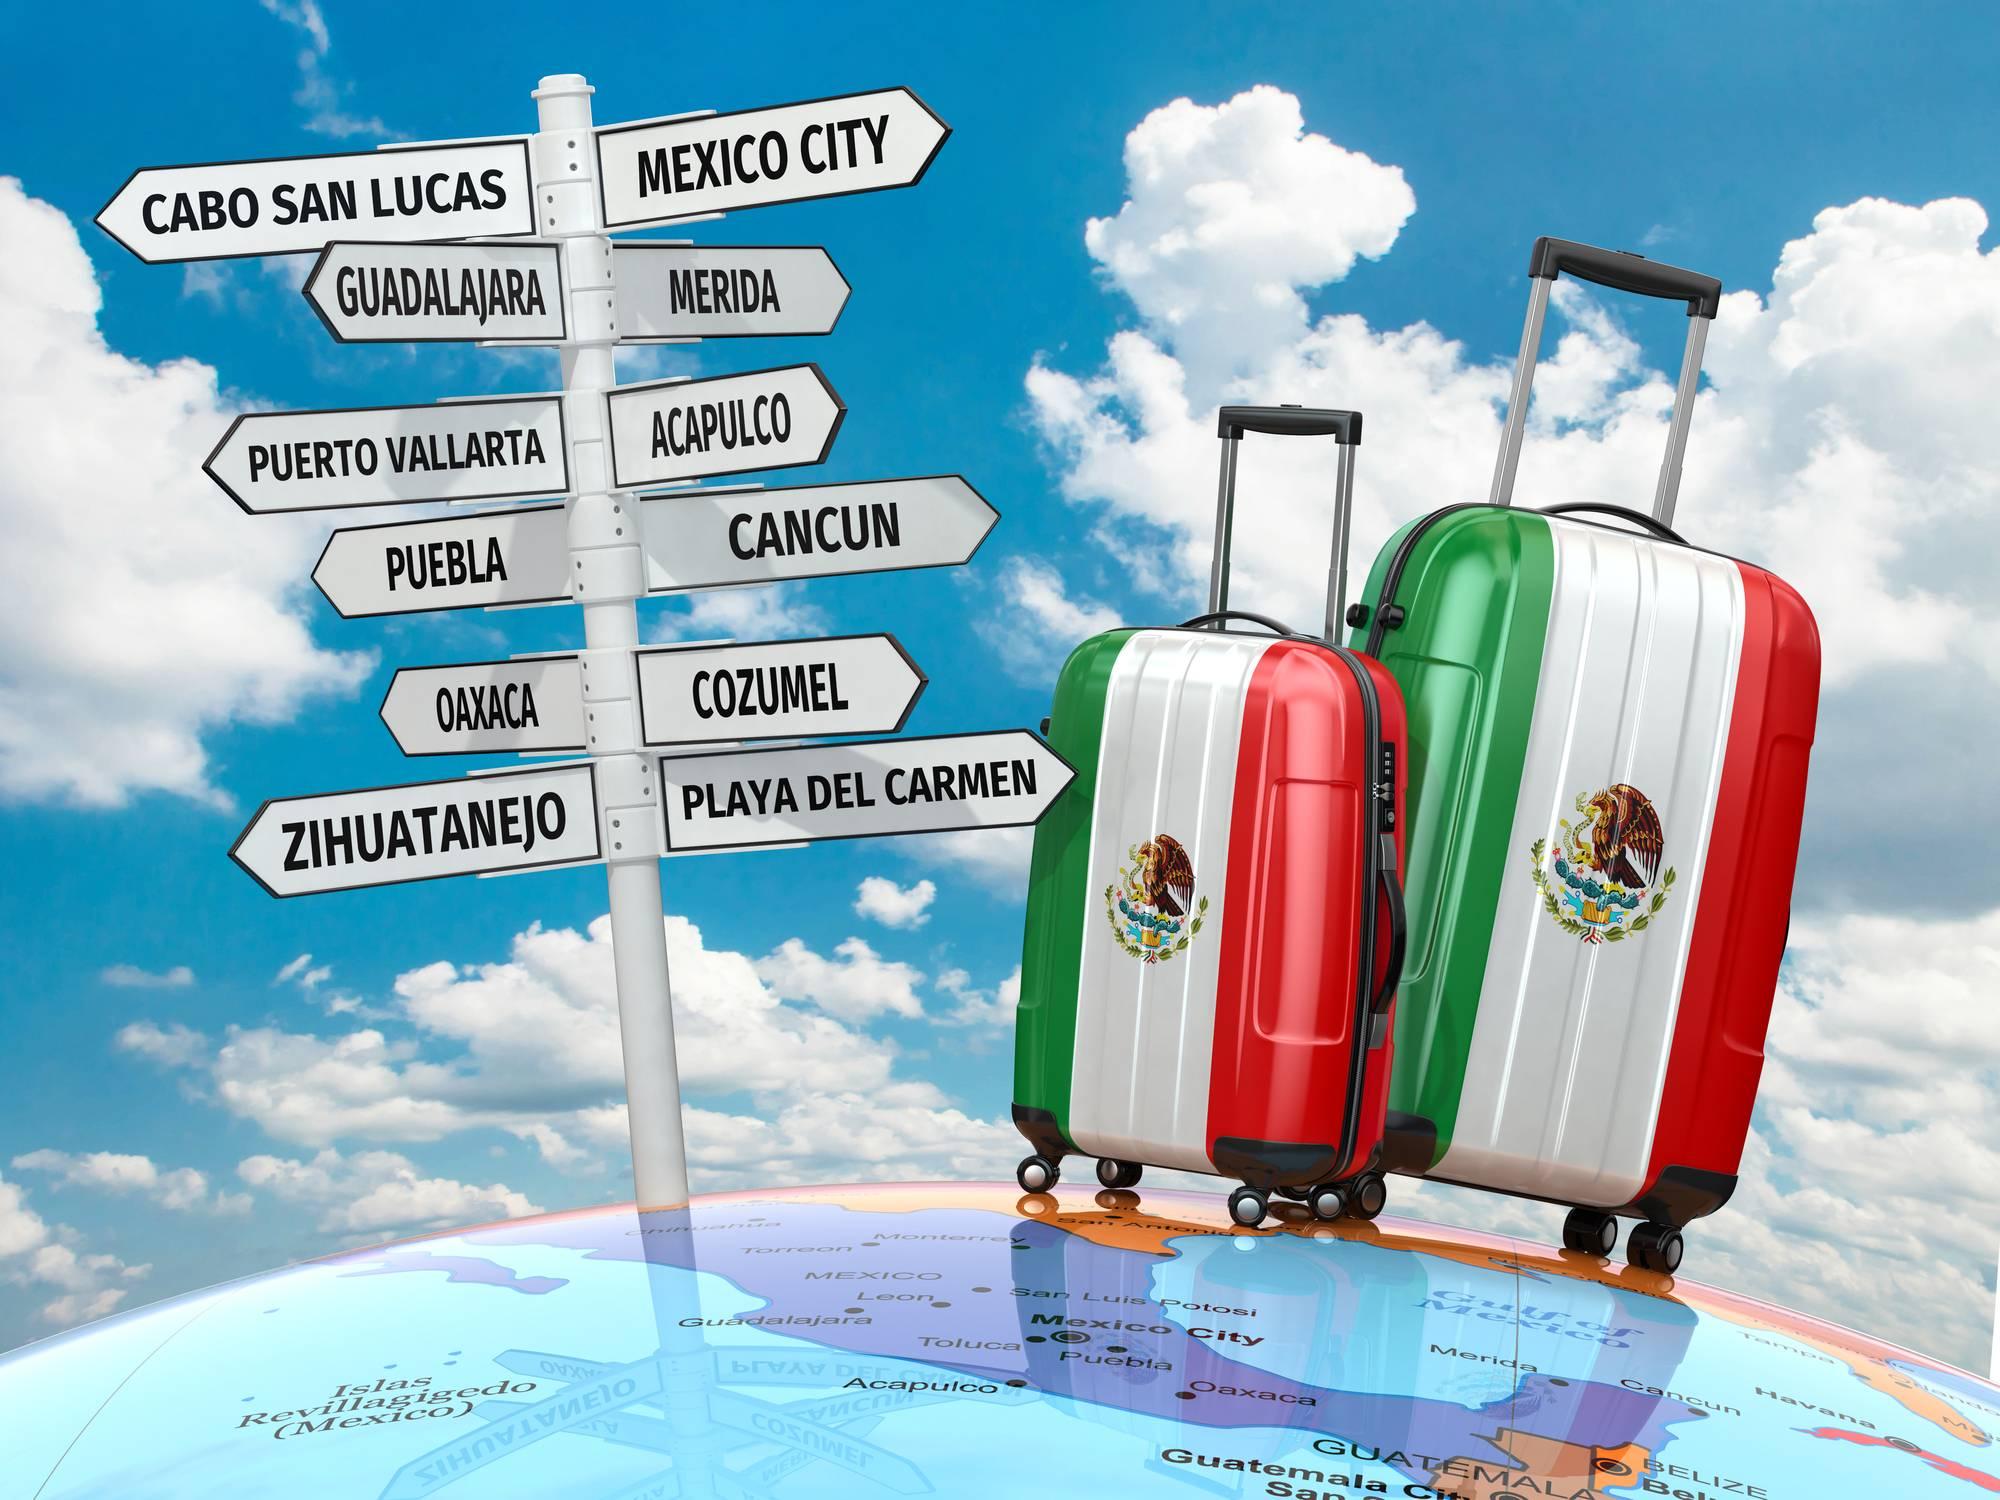 #JenniferWalkerTravel #Mexico